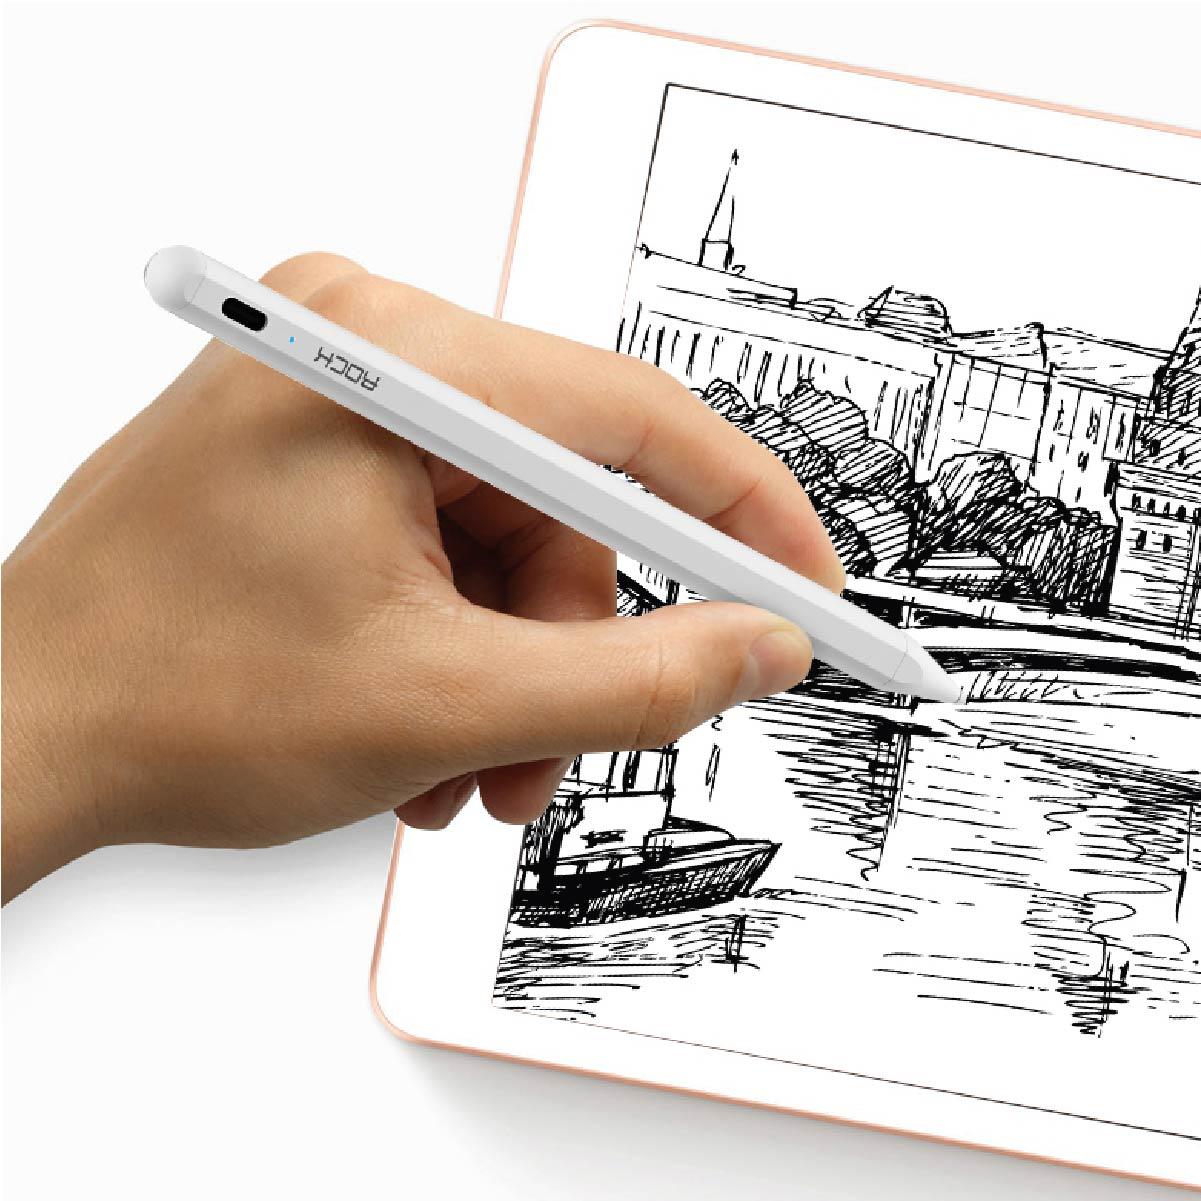 Caneta Stylus Rock B02 Capacitiva Magnética Ativa Para iPad Pro